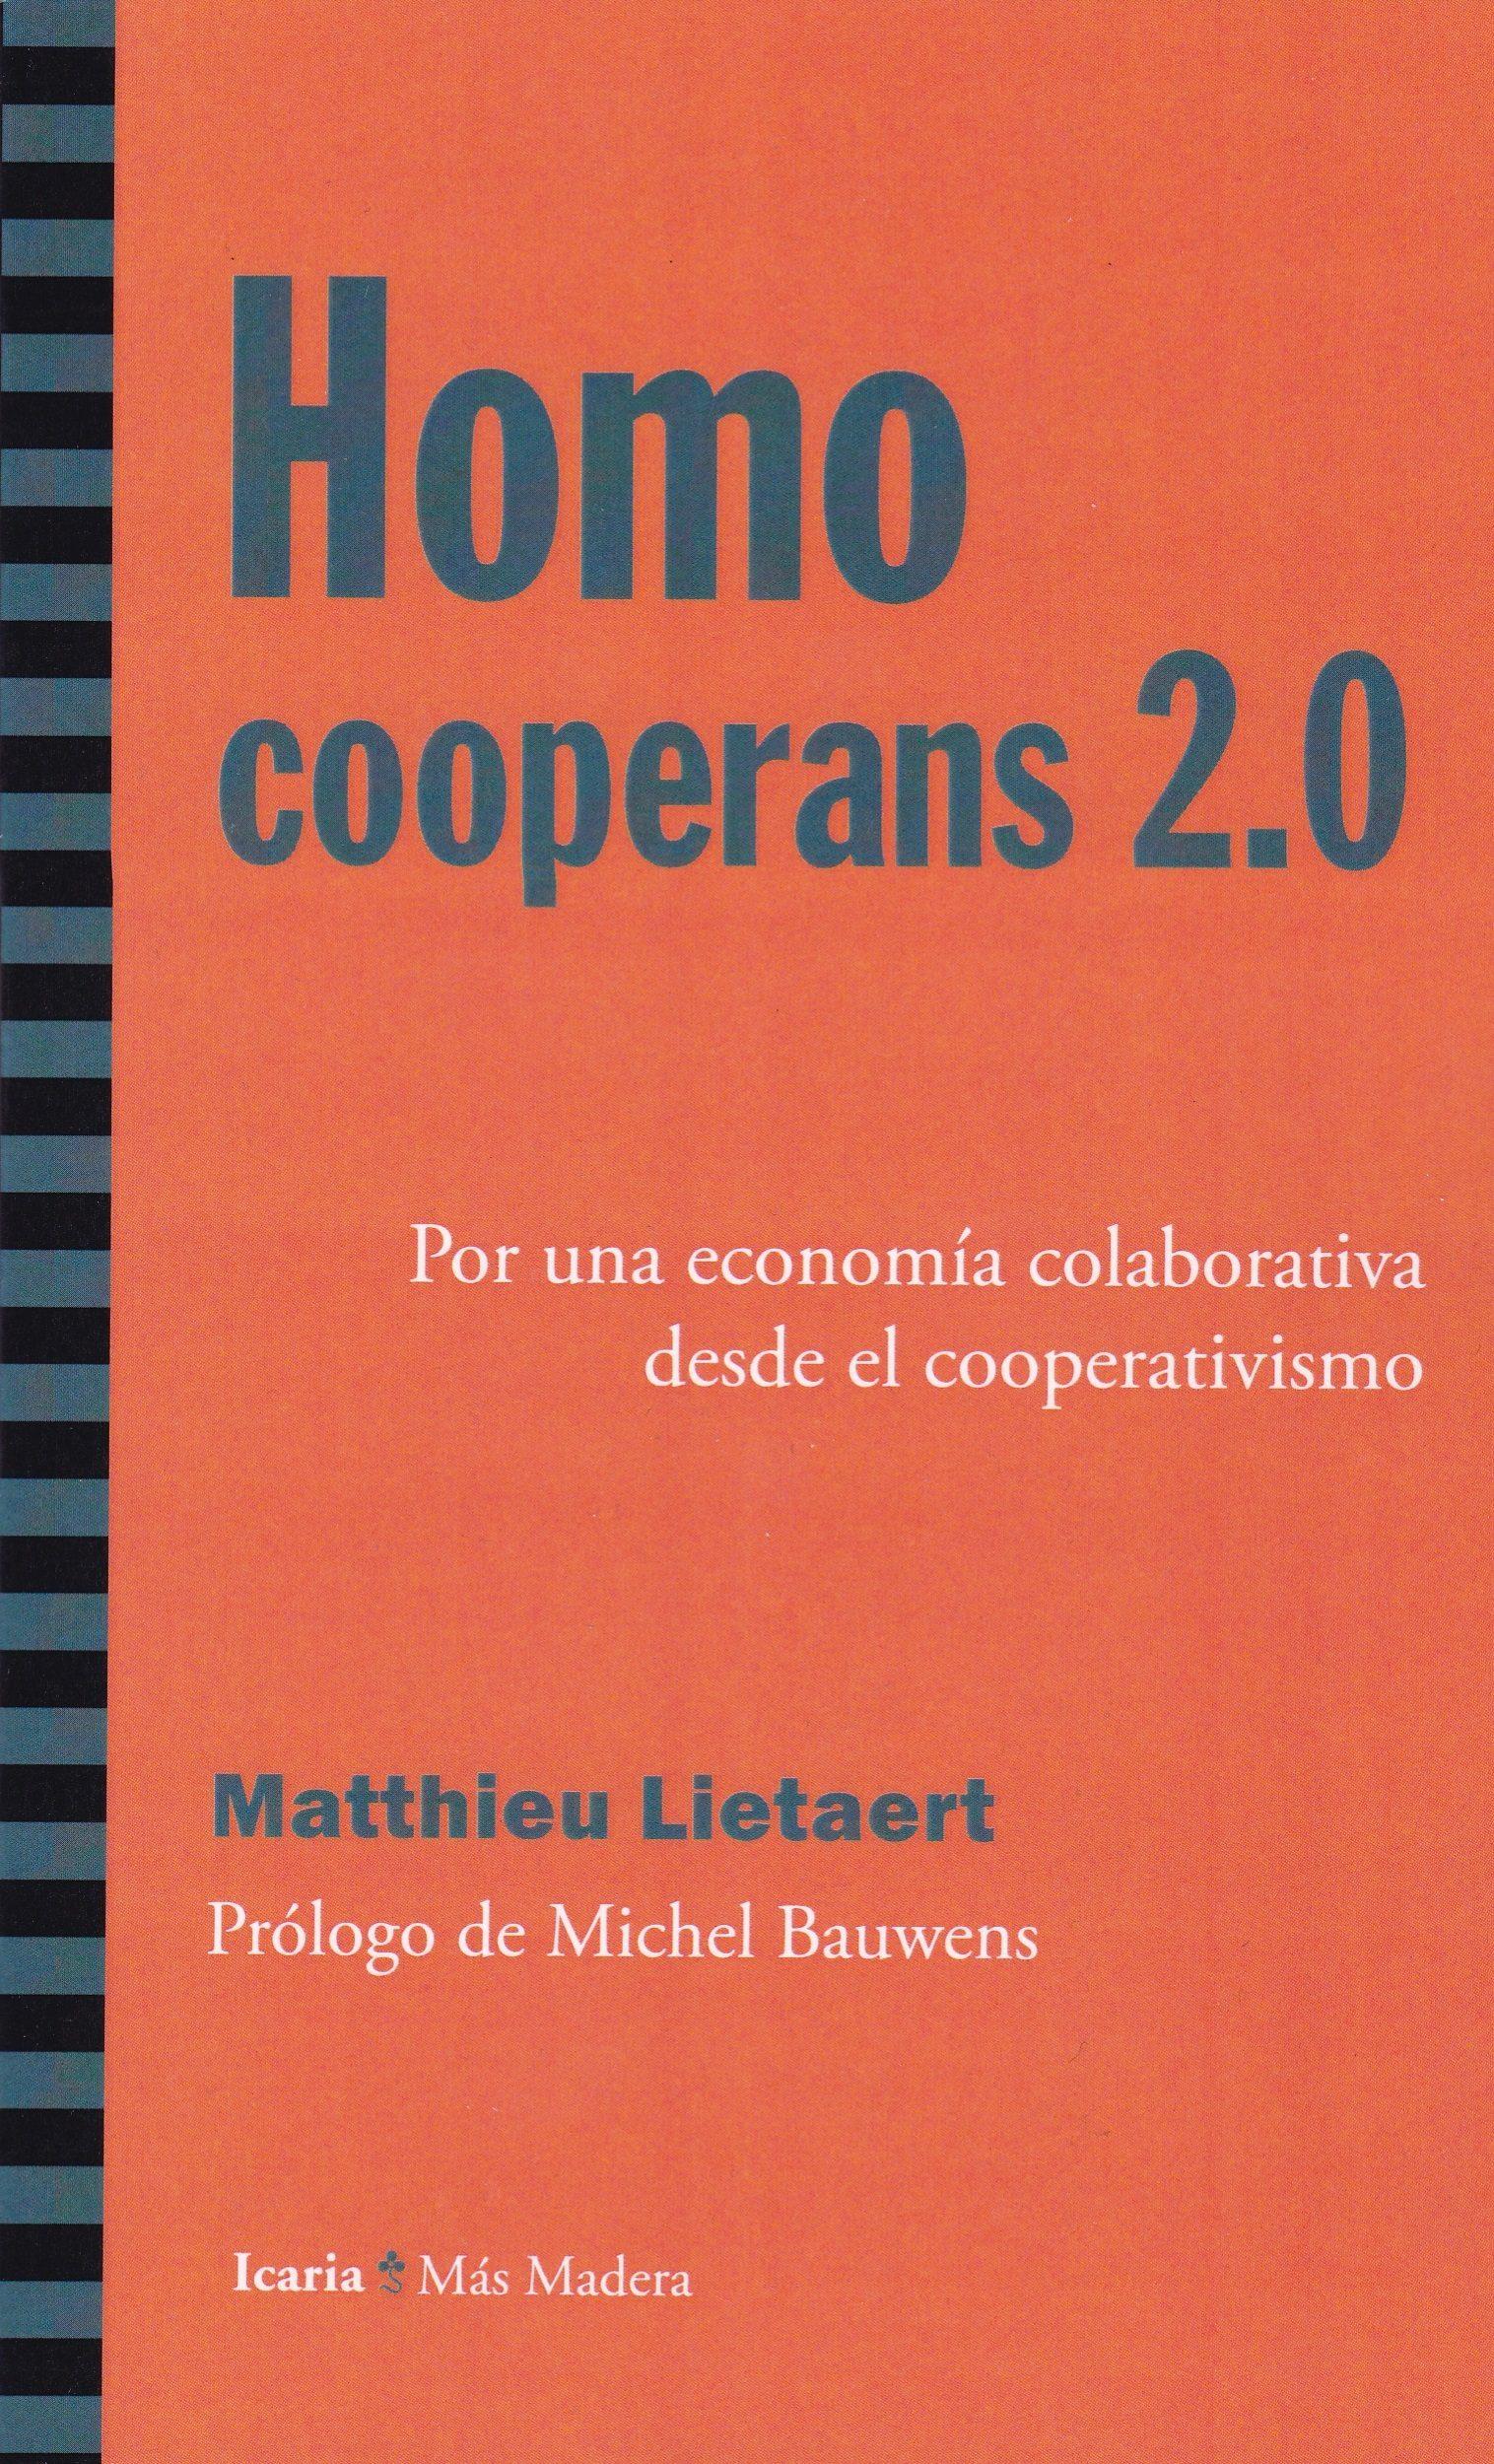 Homo cooperans